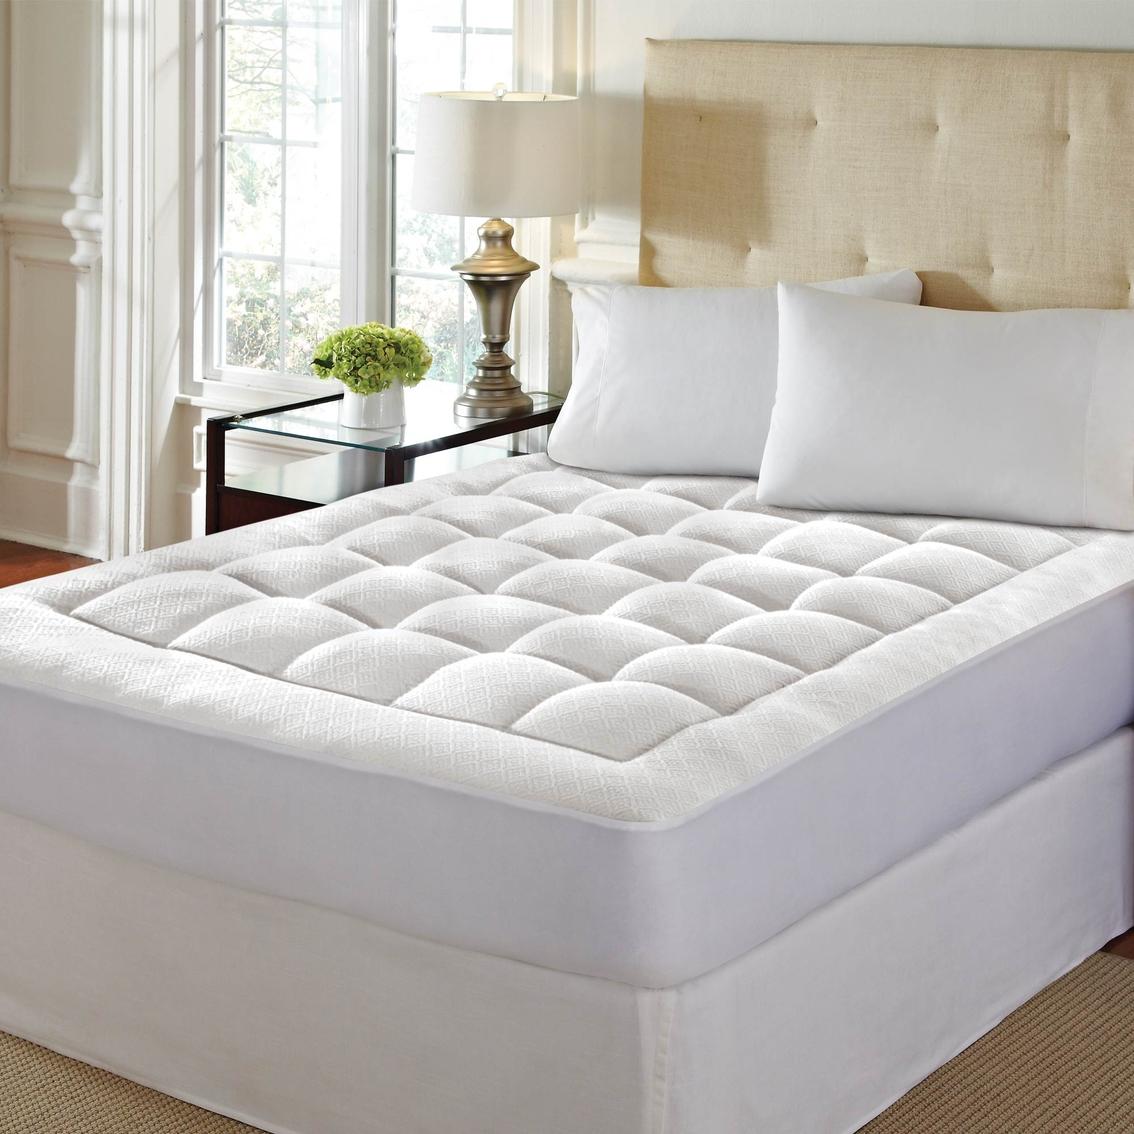 100 home design memory foam mattress pad amazon com gel memory foam mattress topper queen - Home design mattress pads ...